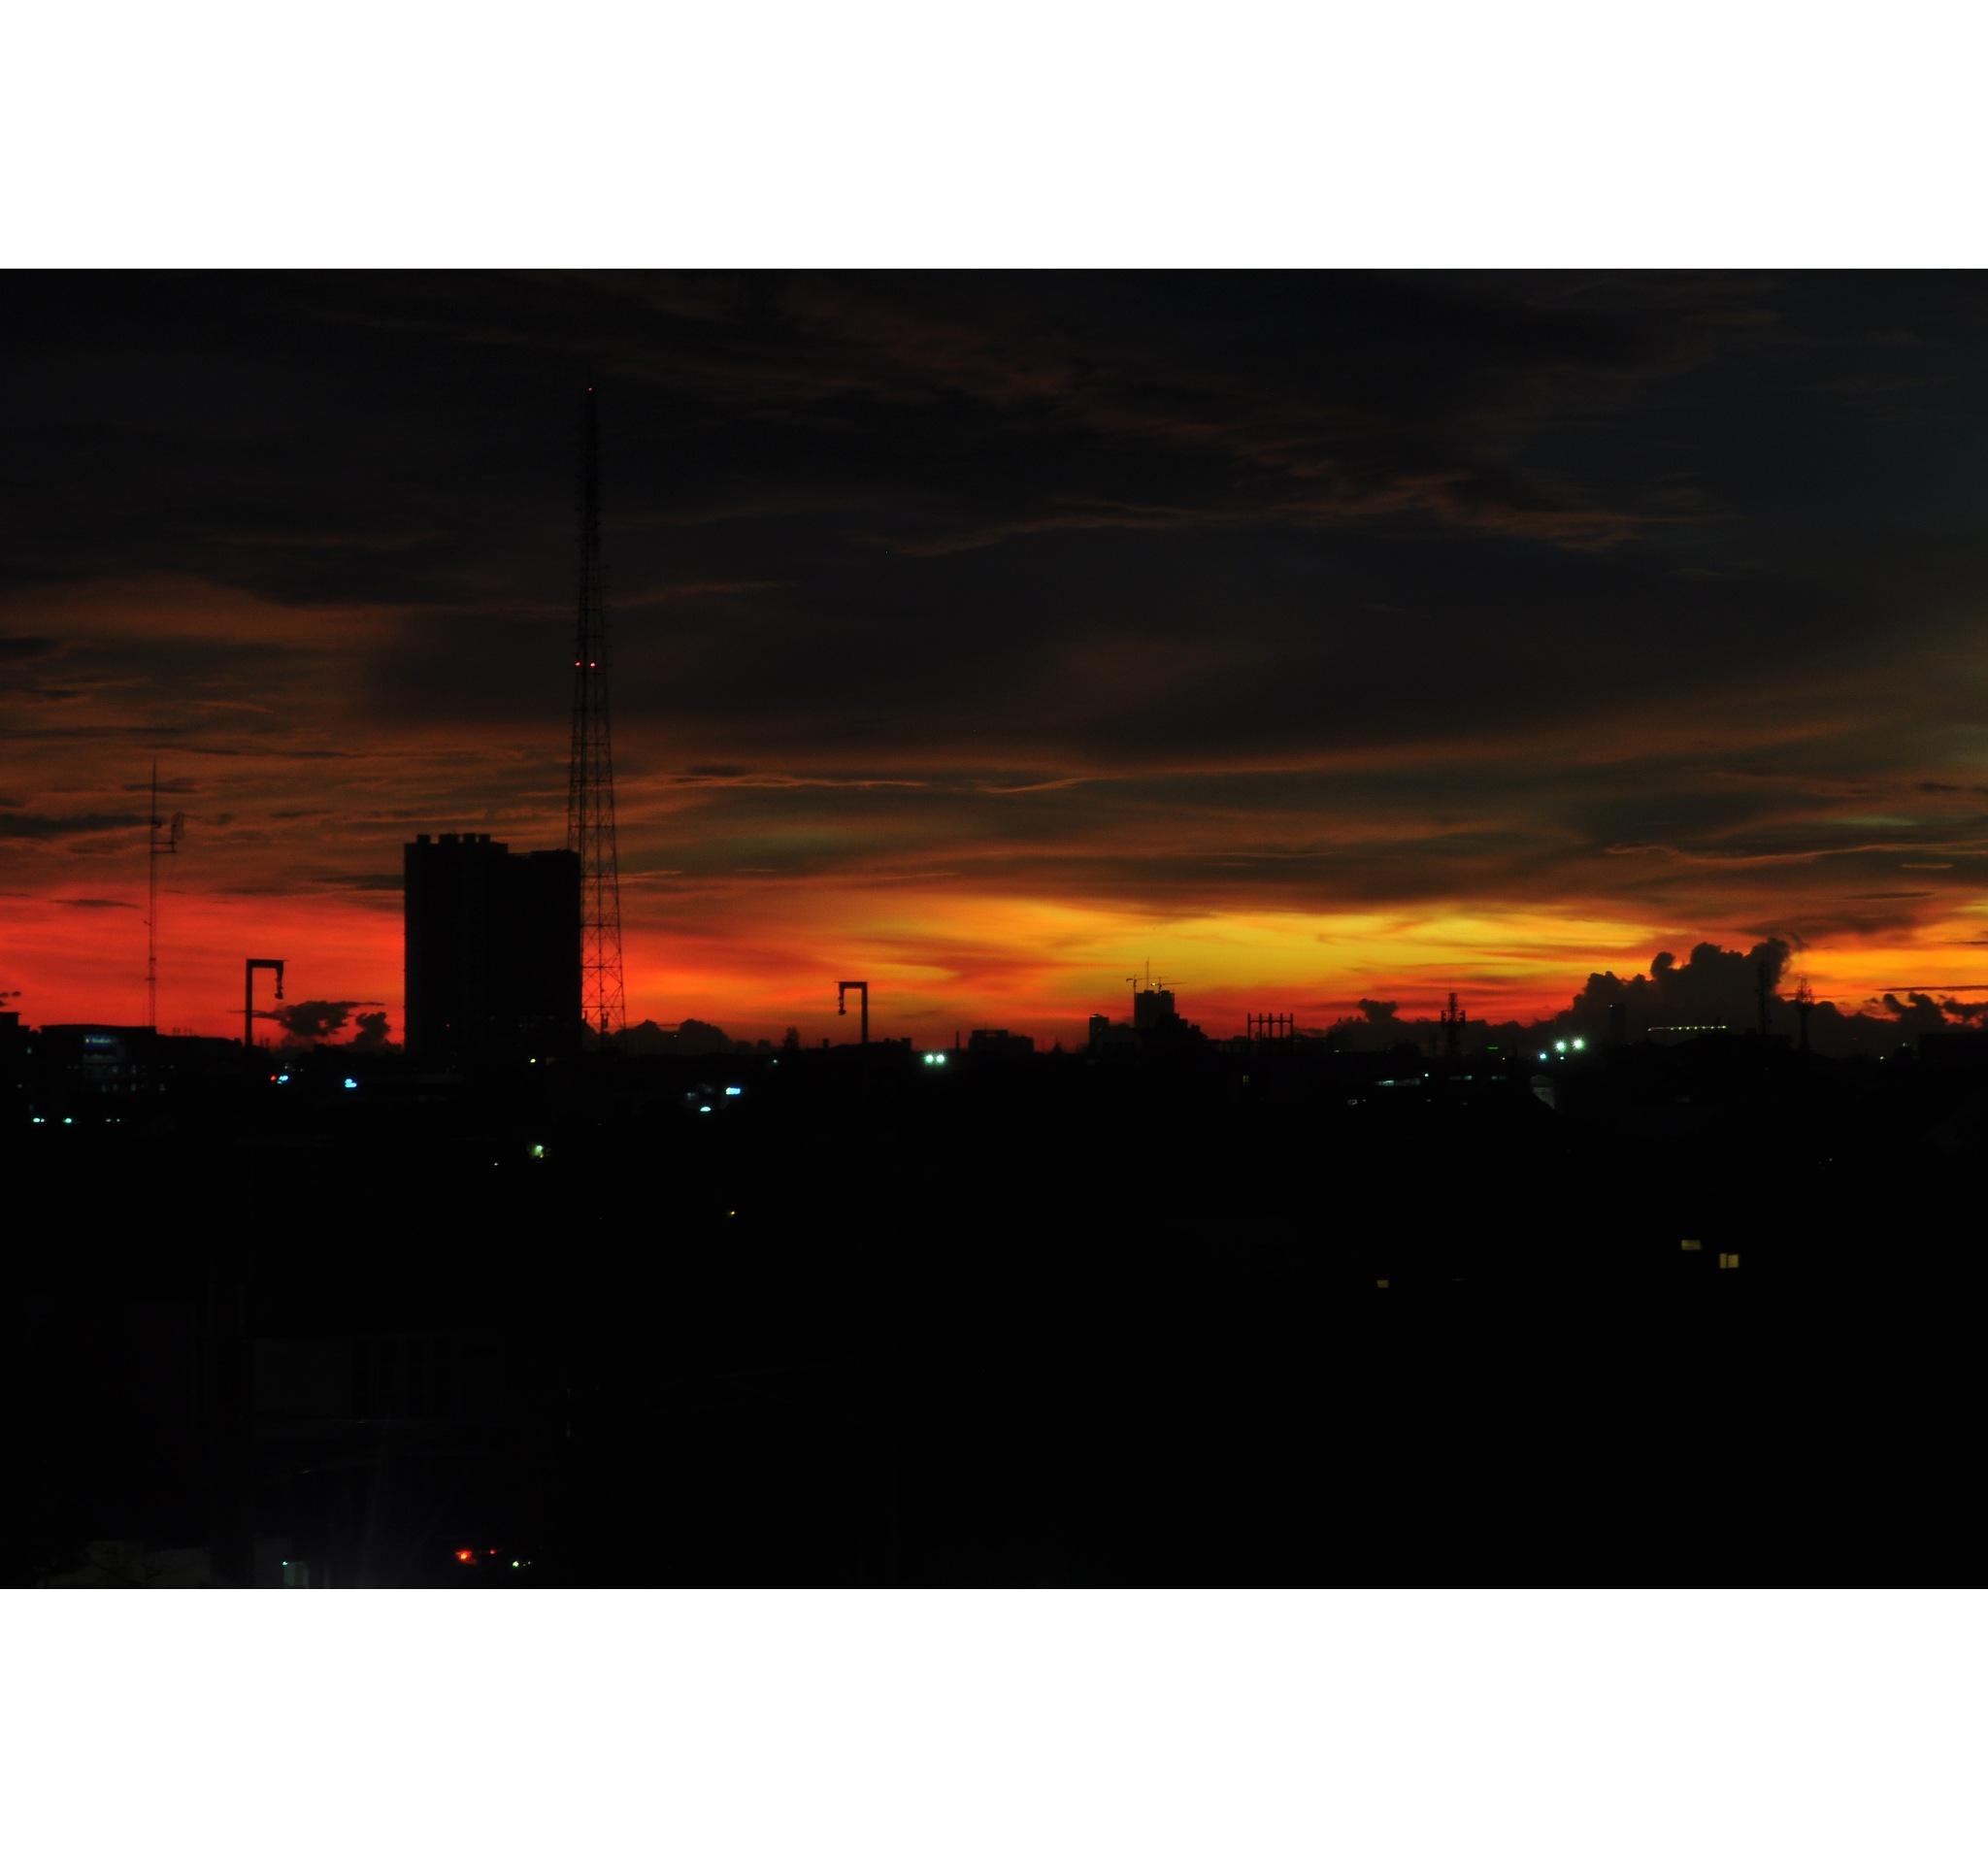 Sunset in jakarta  by yusufprisdiantoro